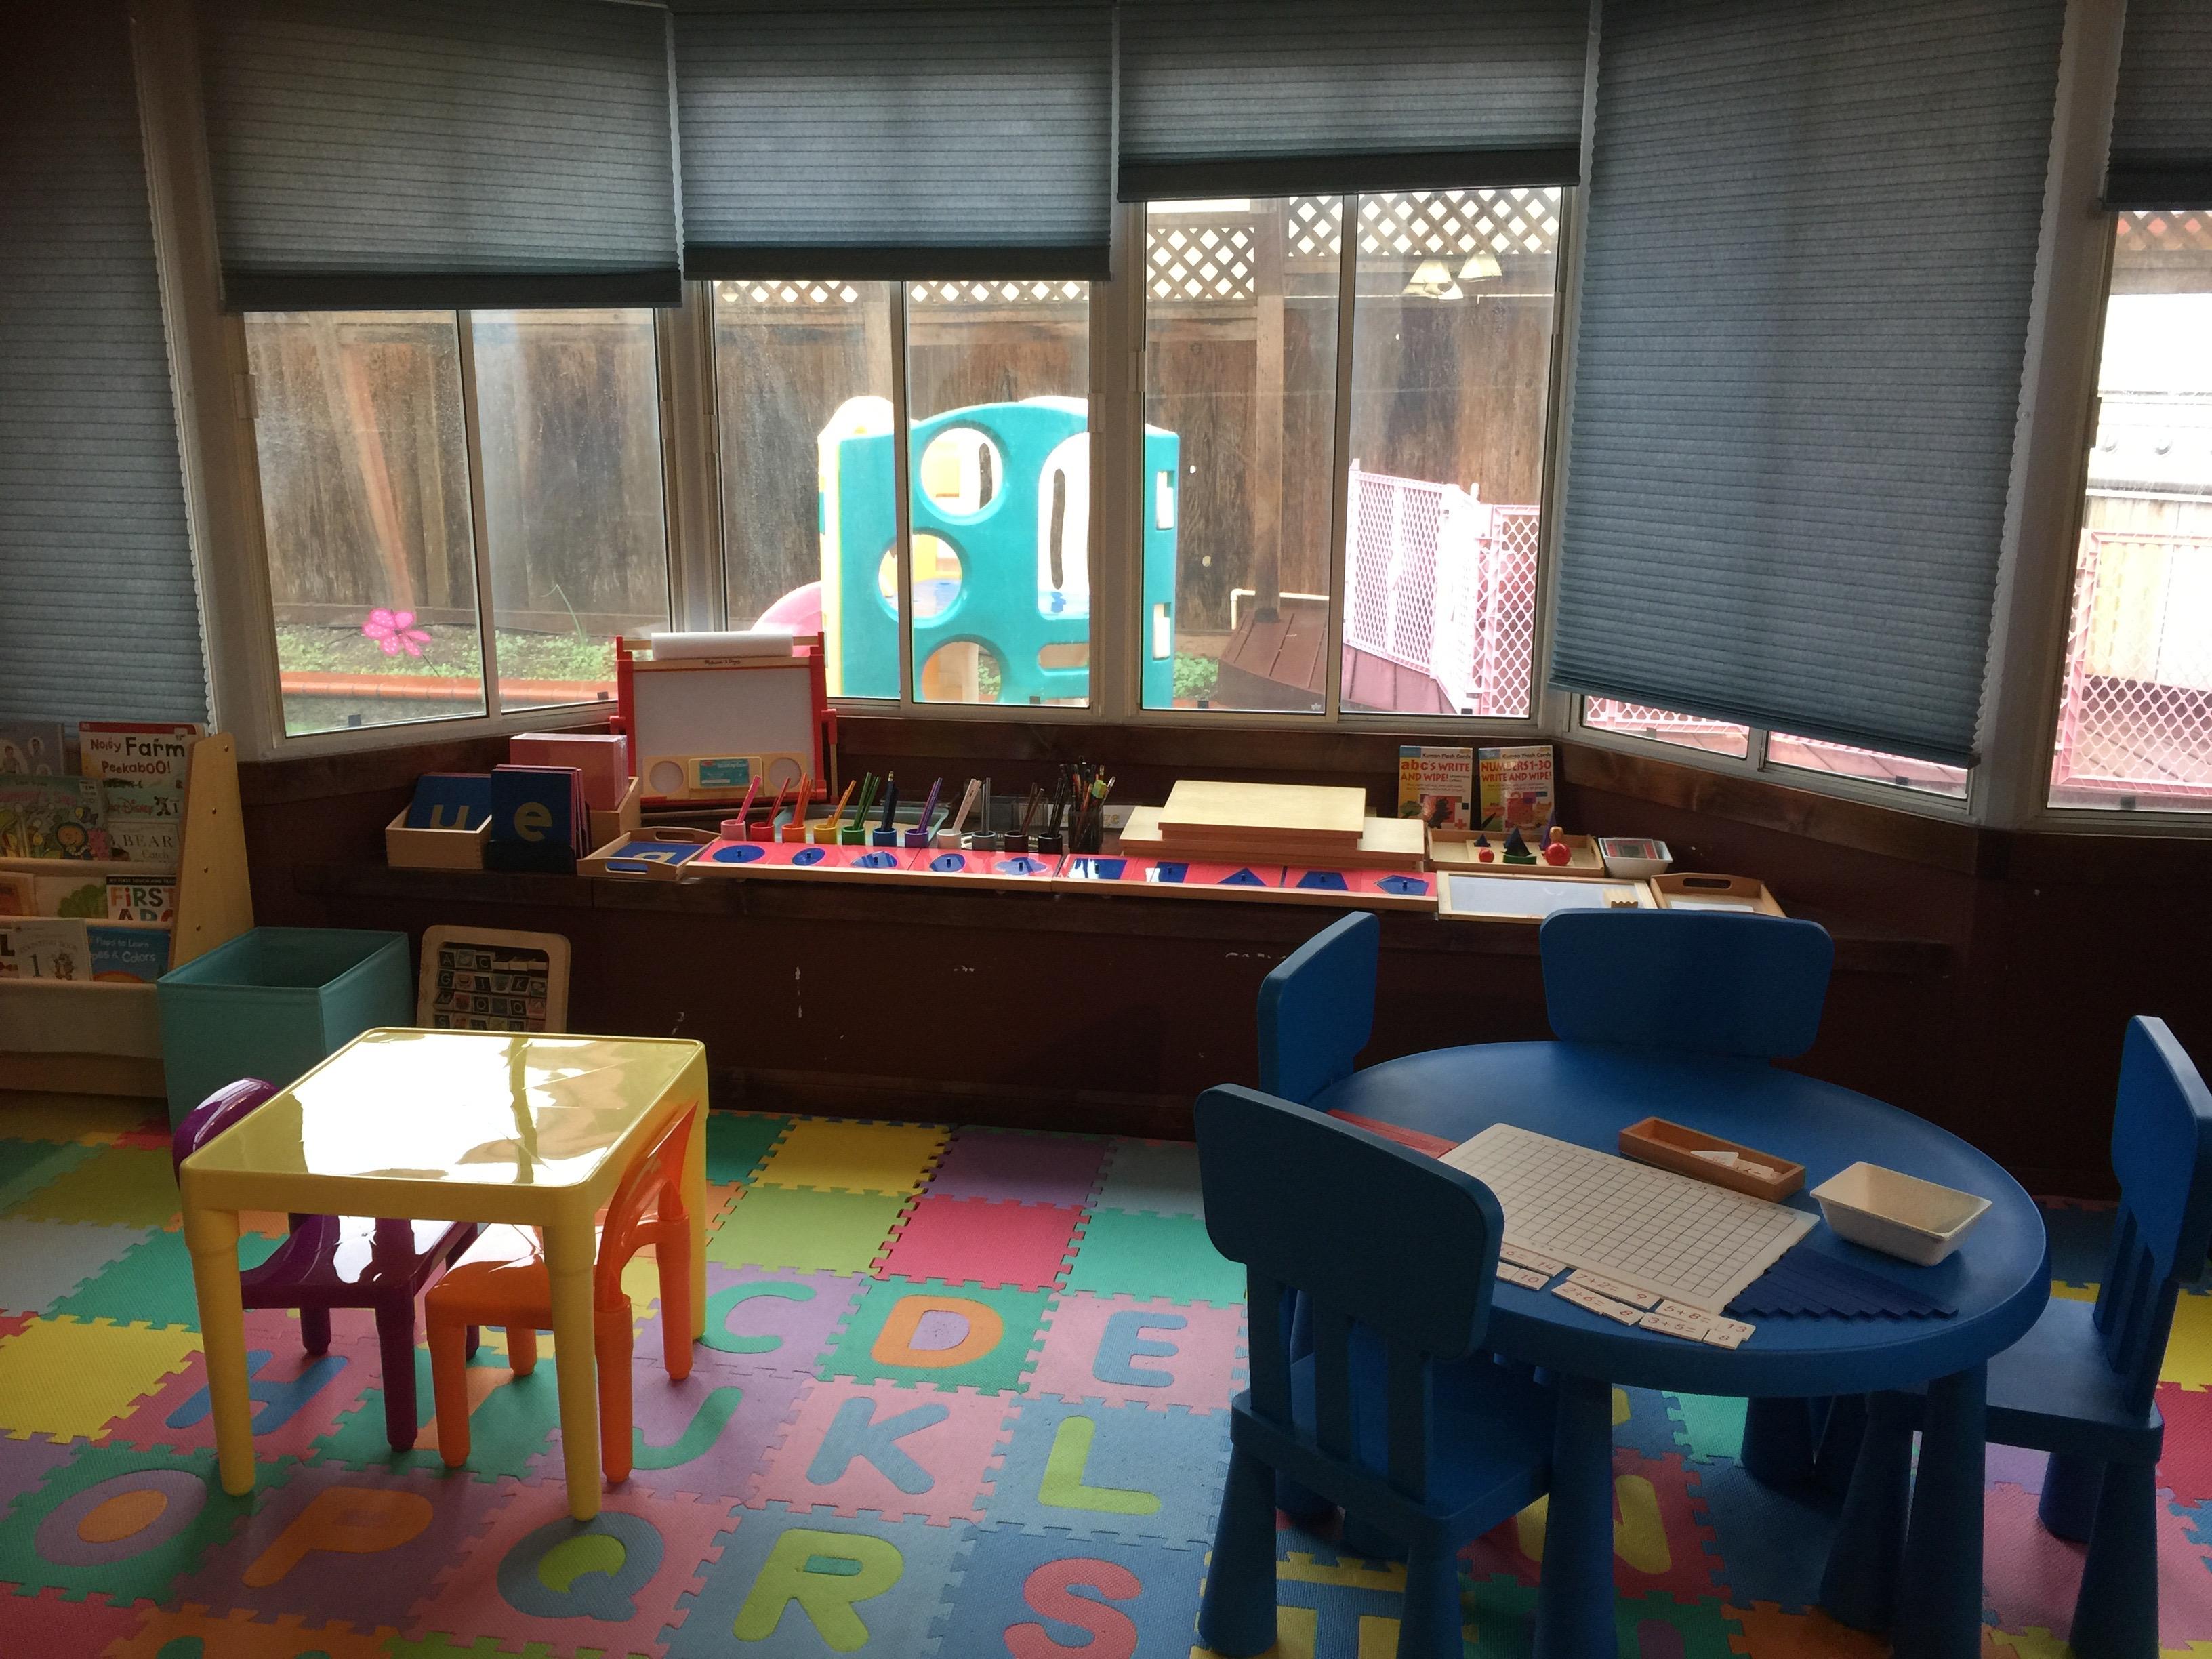 #2 Classroom 1